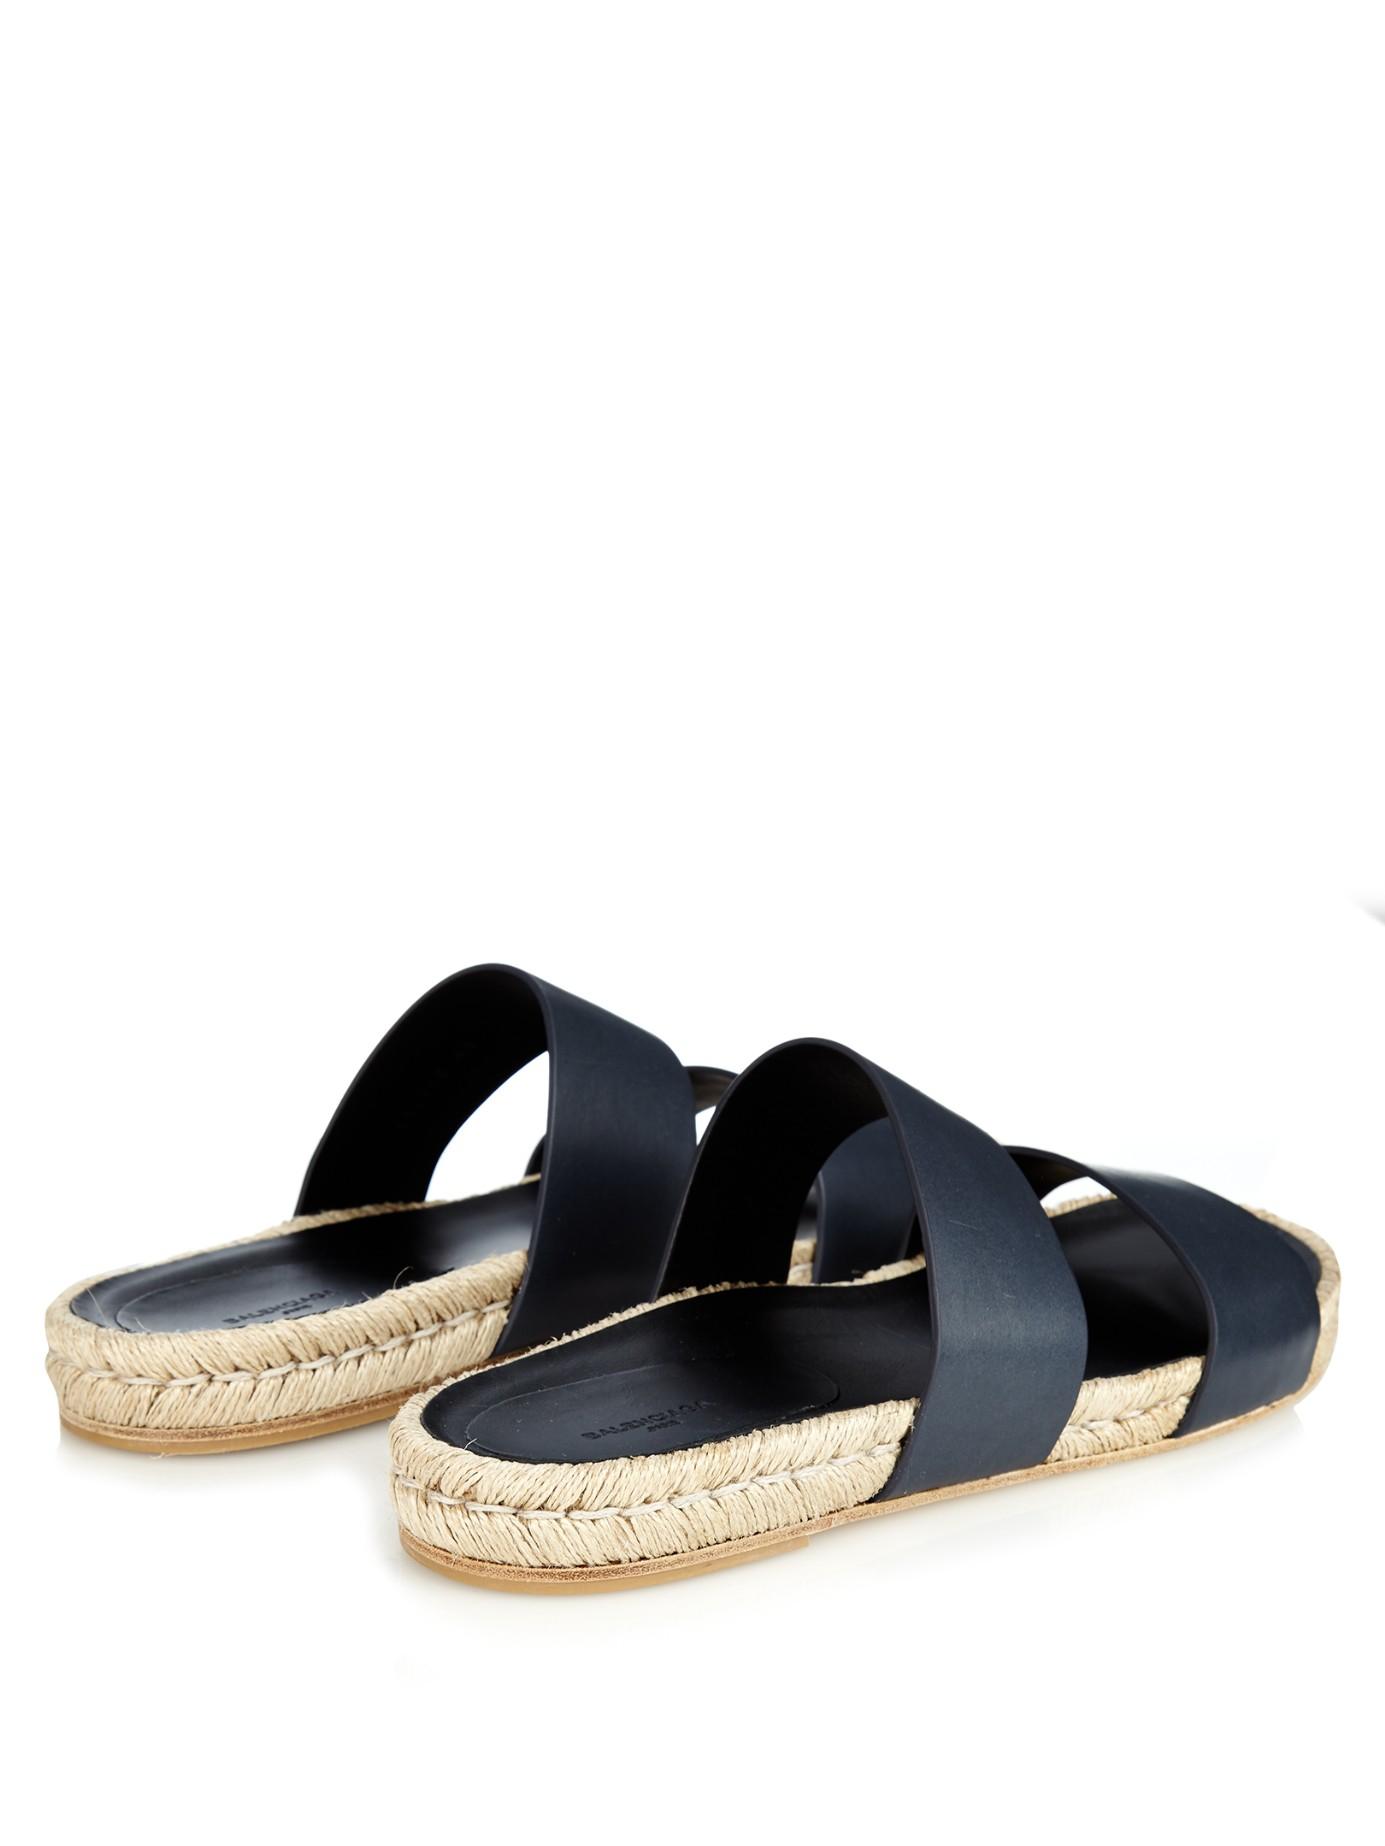 Lyst - Balenciaga Leather Espadrille Sandals in Blue for Men 5522eb0e55